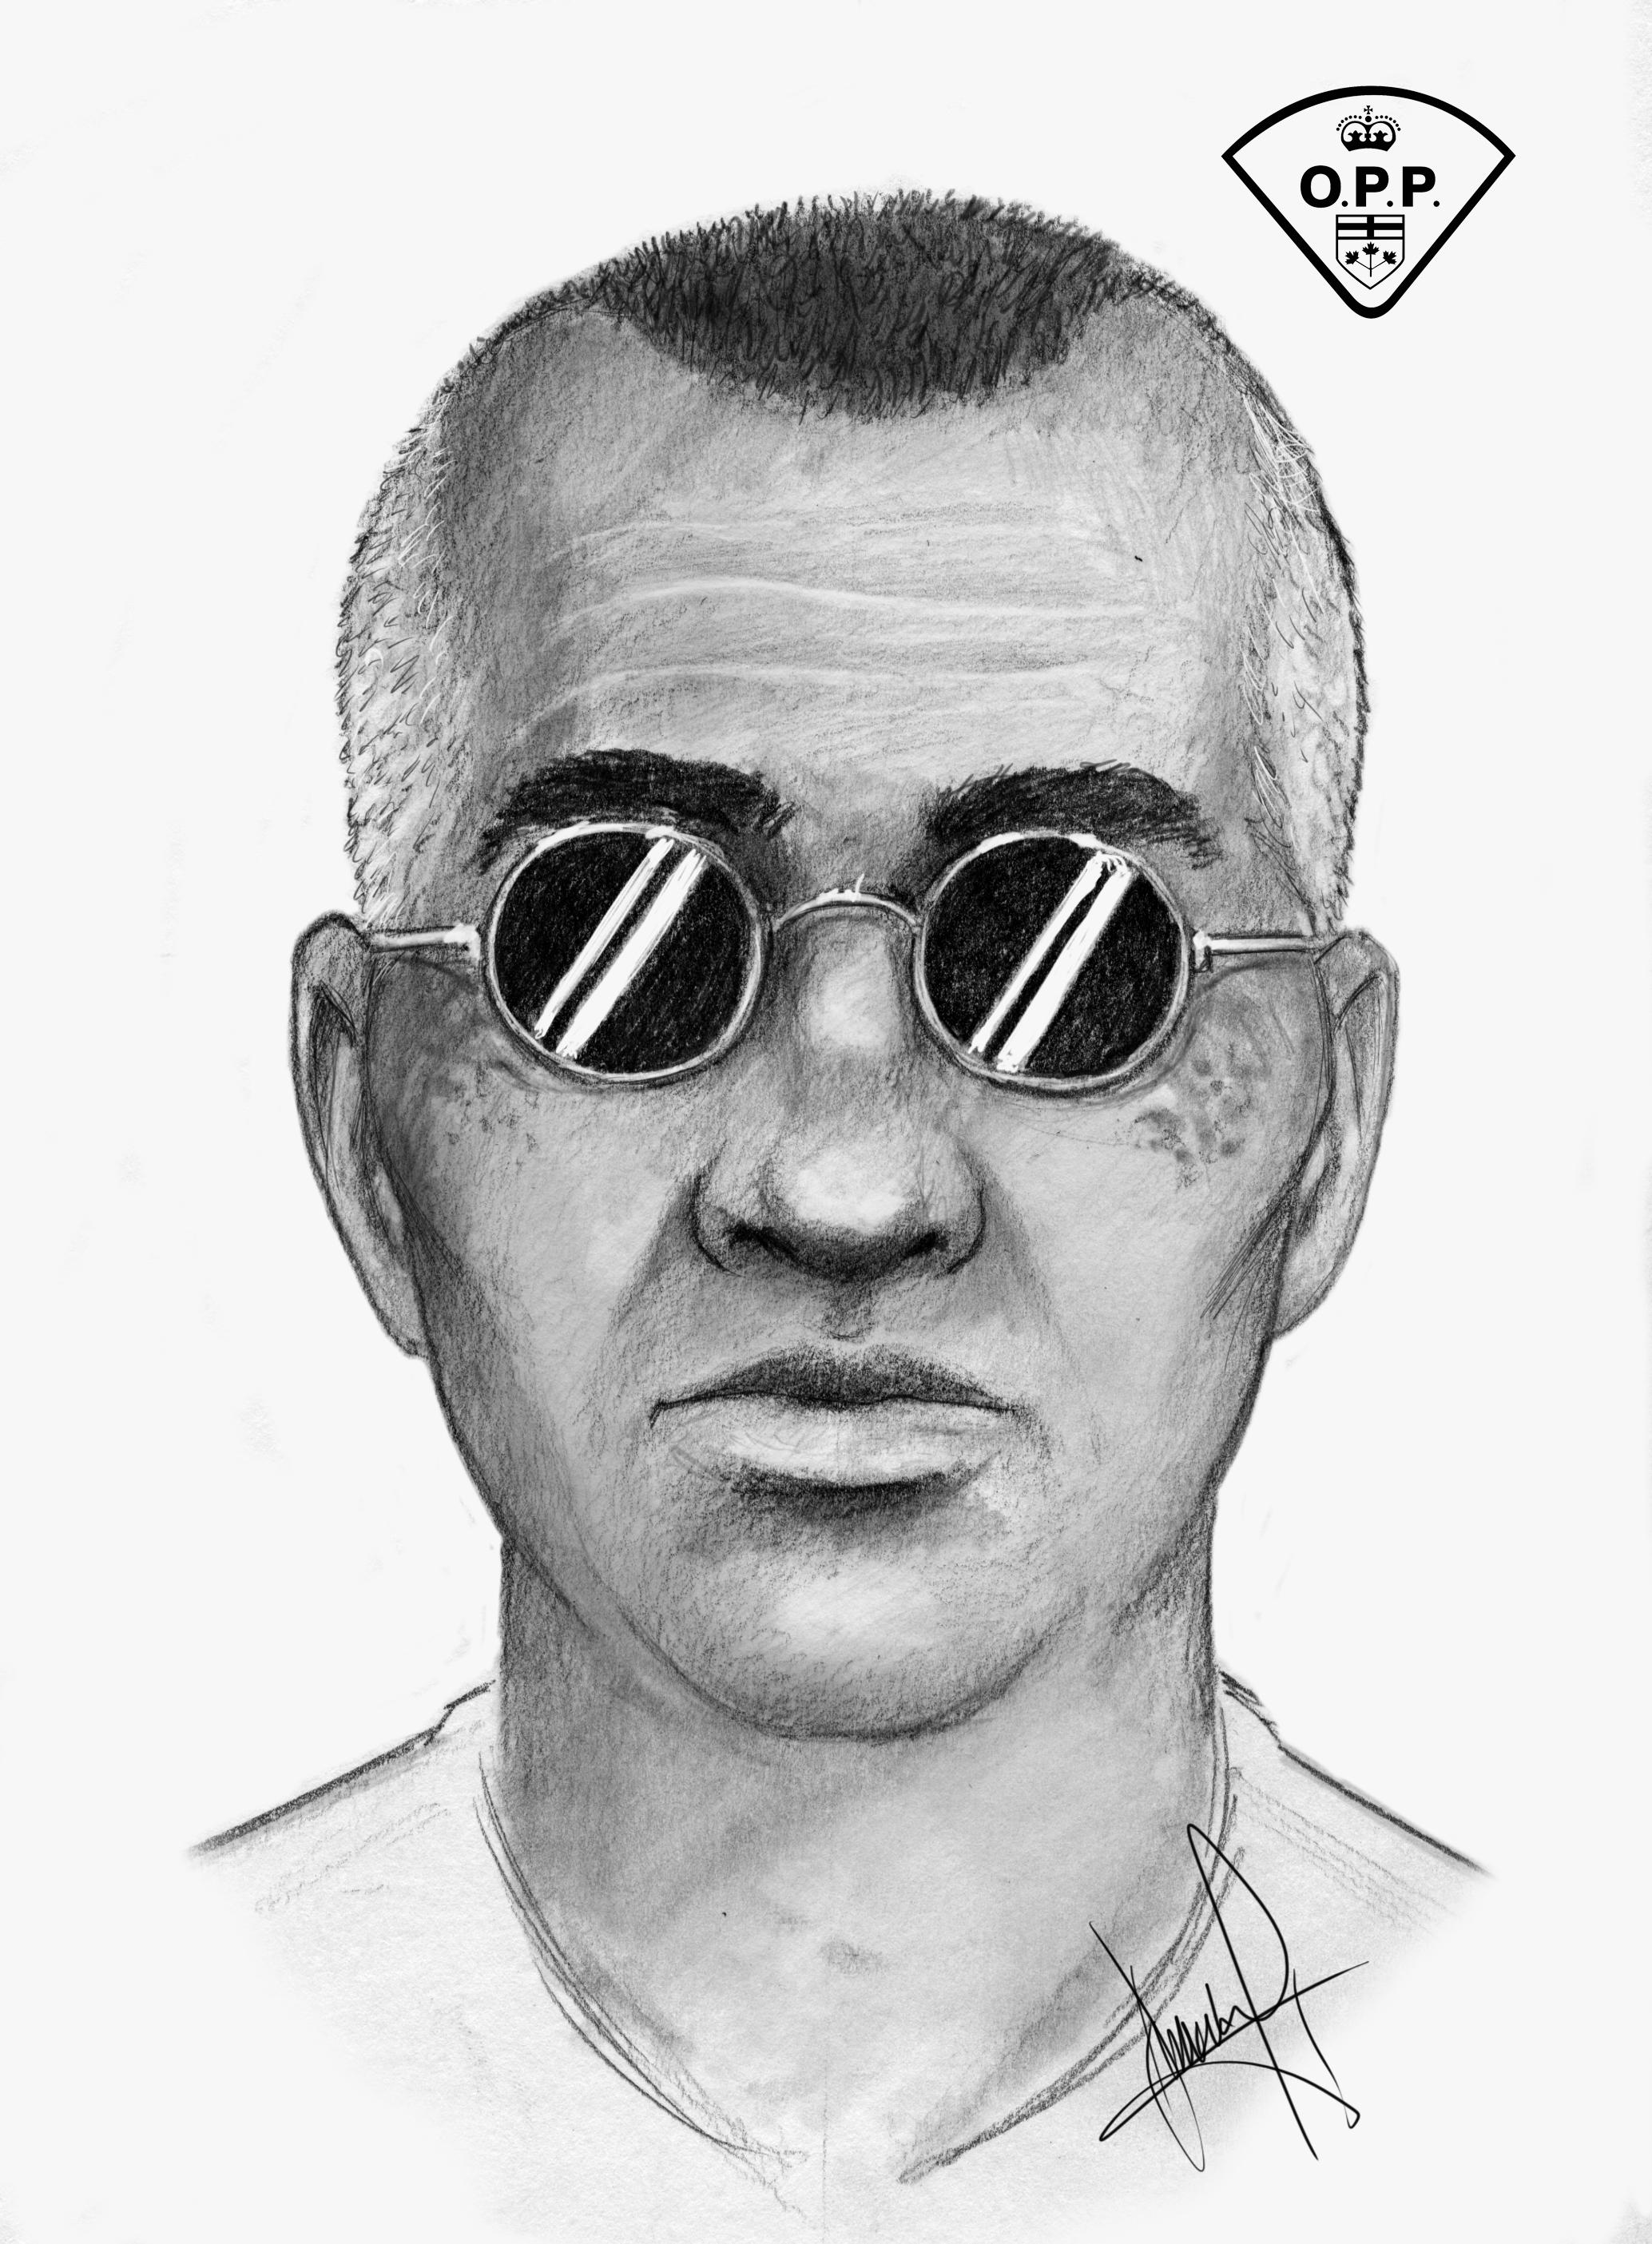 Suspect composite sketch OPP re Attempt Abduction